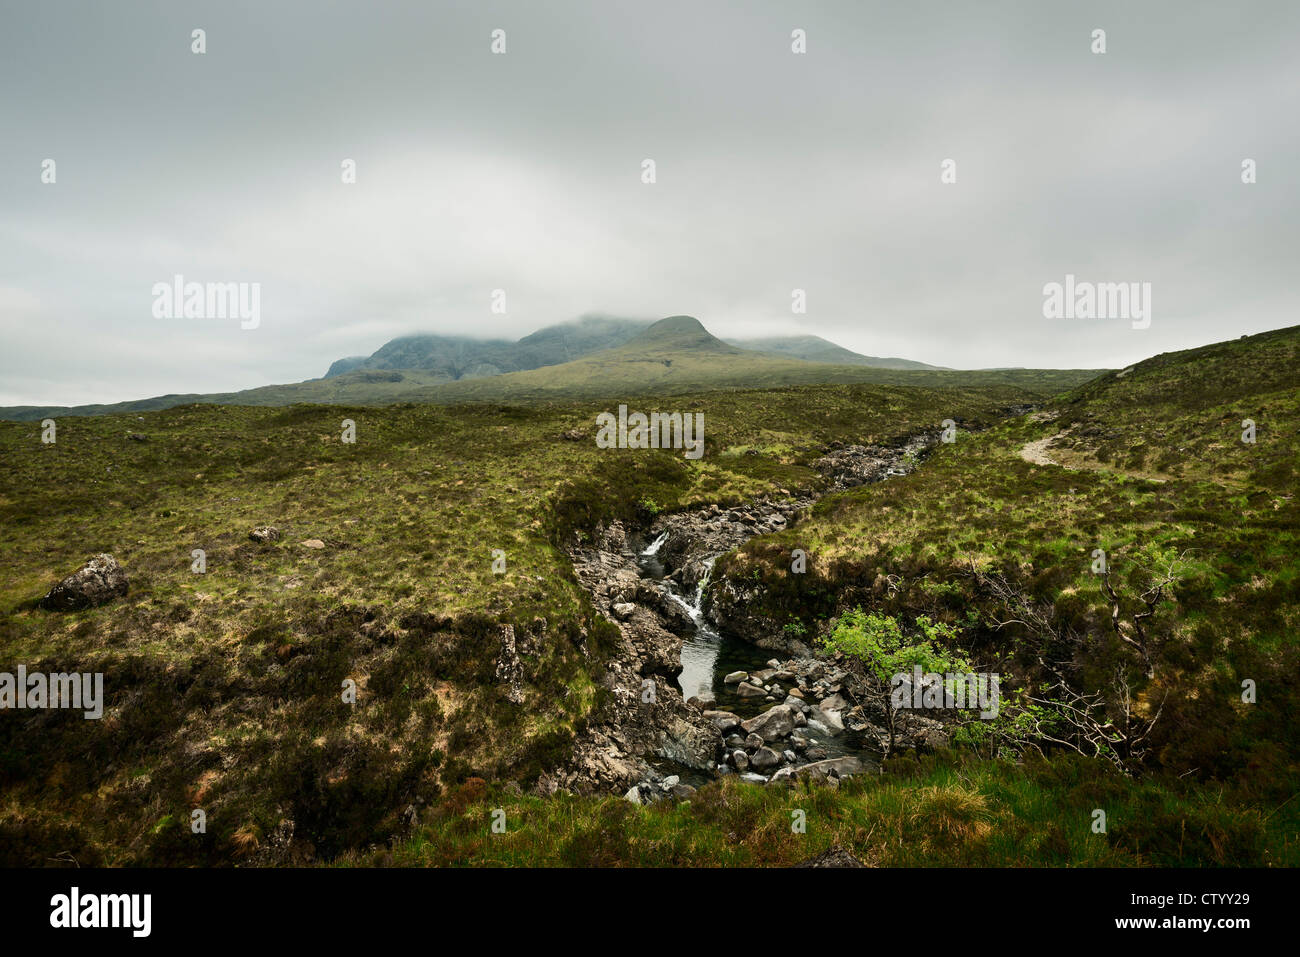 Mossy rocks in rural landscape - Stock Image